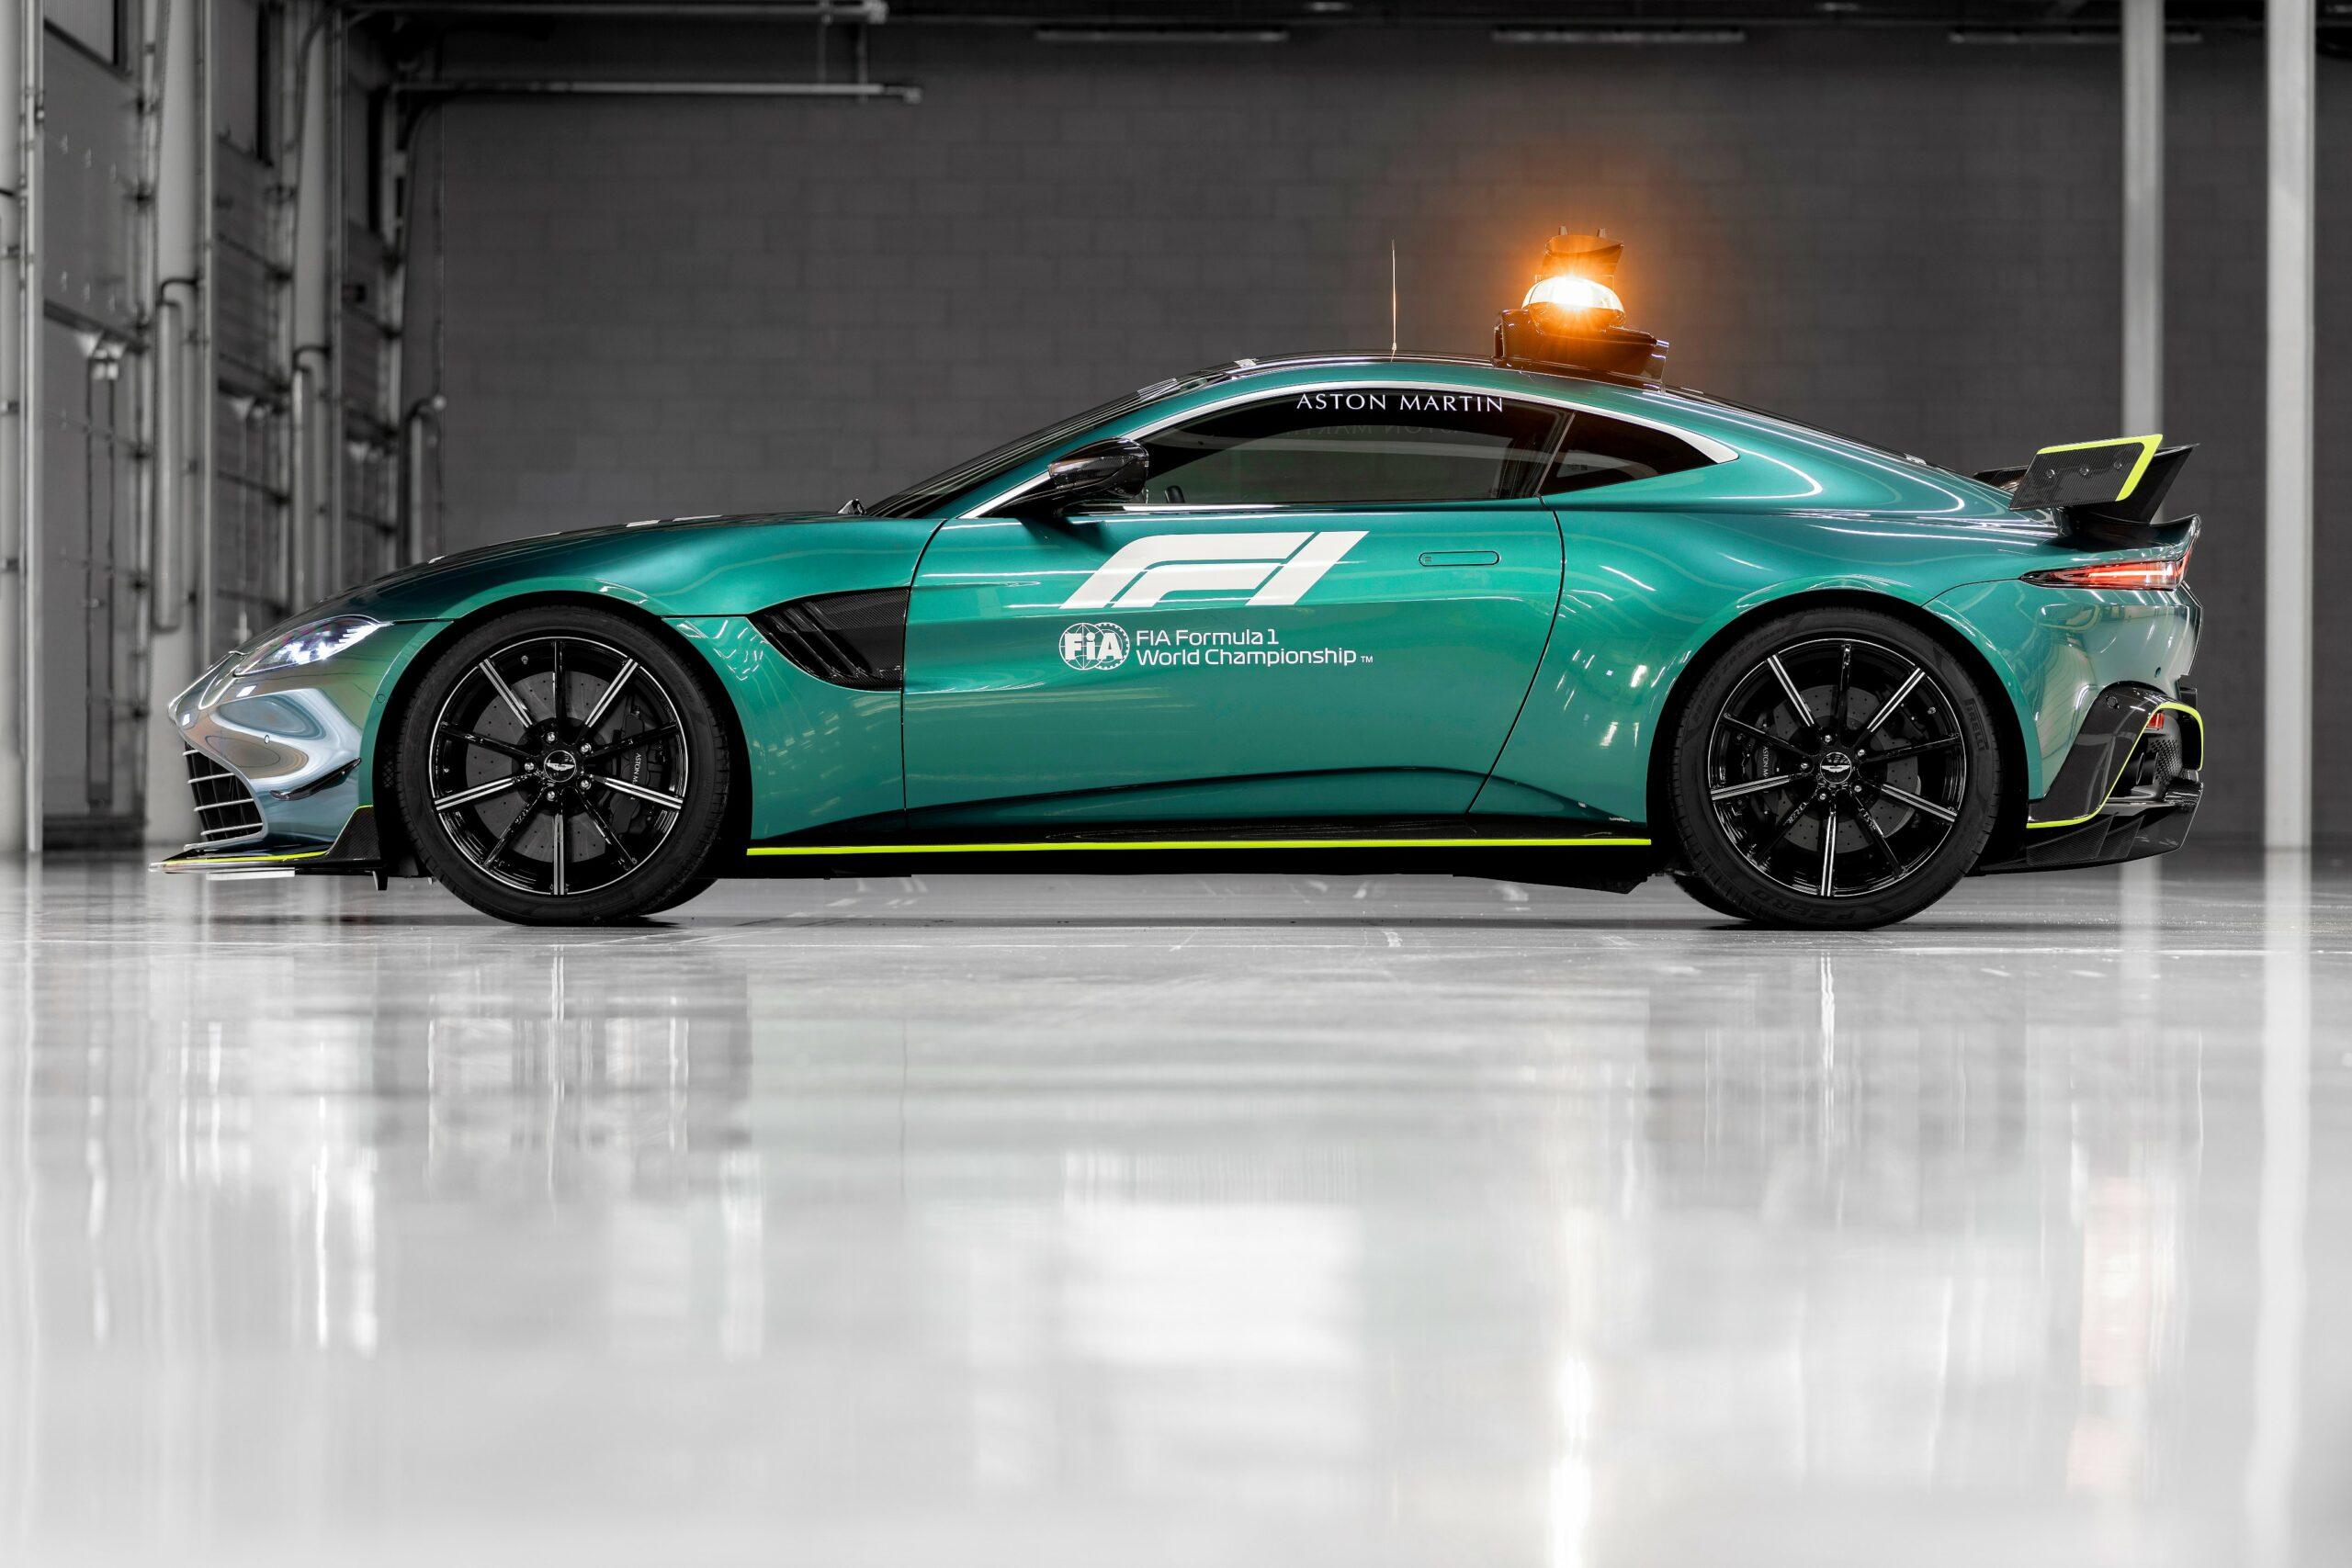 F1 - Aston Martin et Mercedes fourniront la Safety Car à la F1